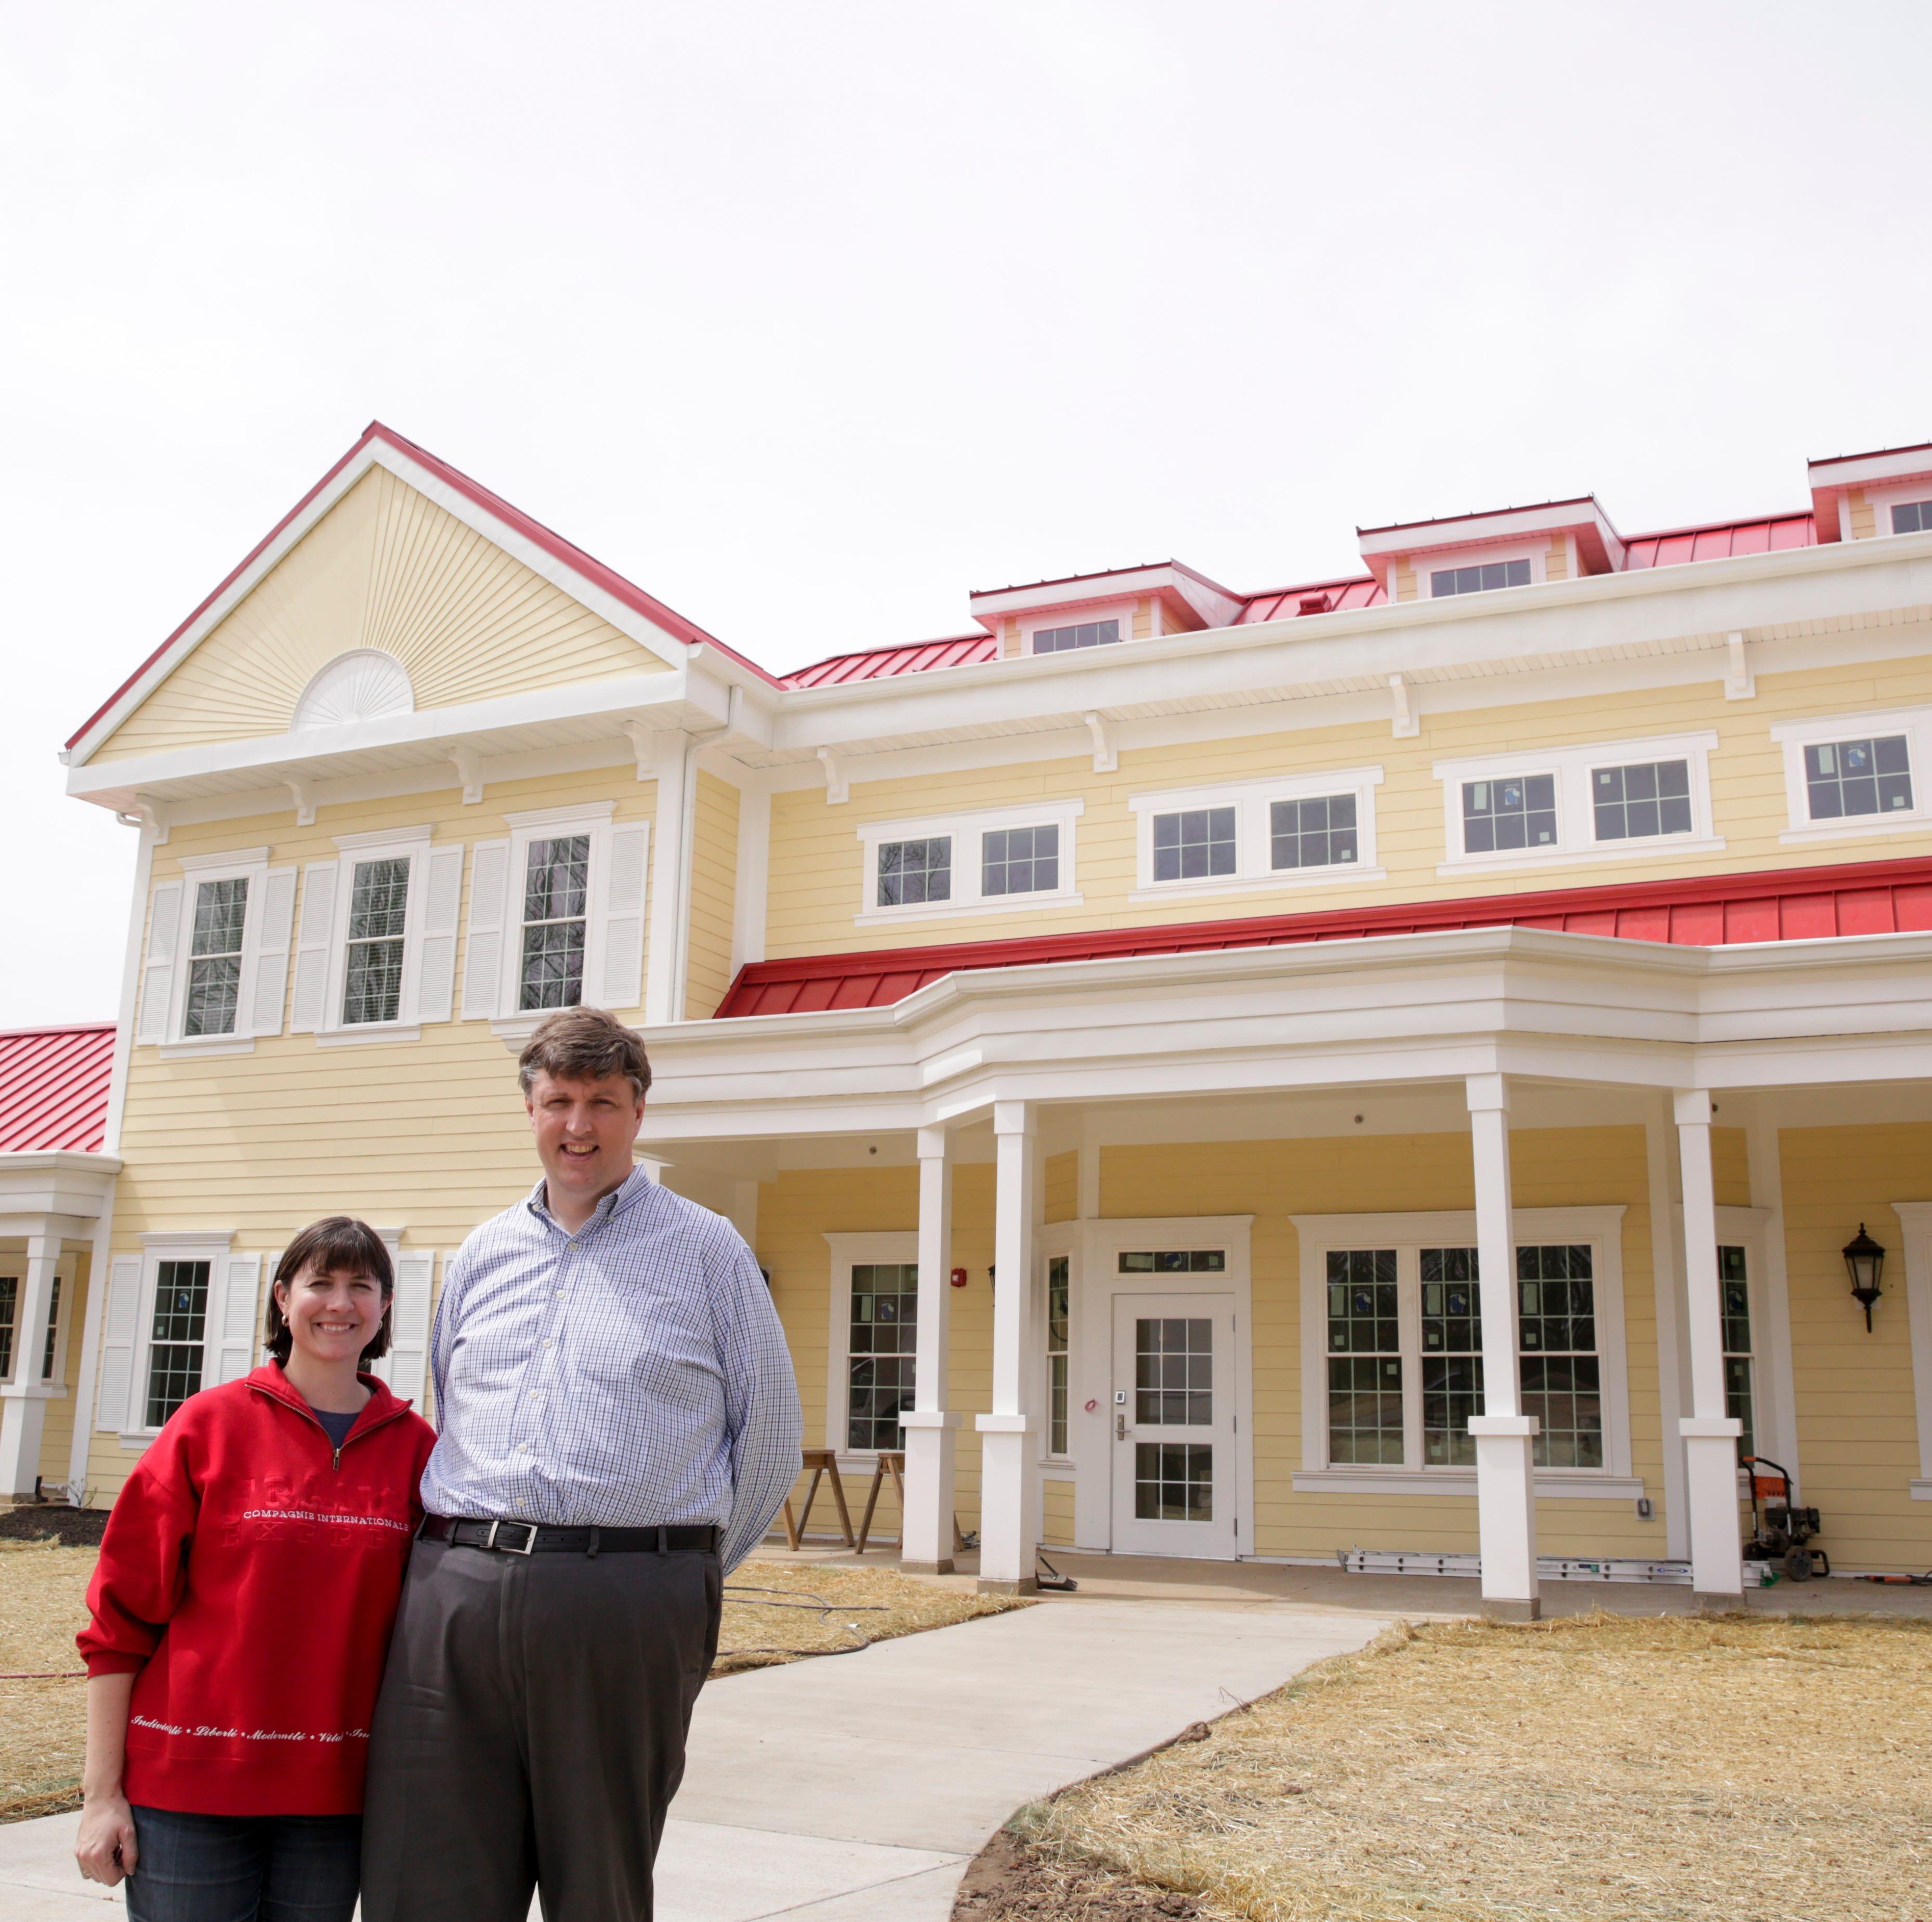 Purdue alumni return to West Lafayette to open 'The Whittaker Inn' bed and breakfast